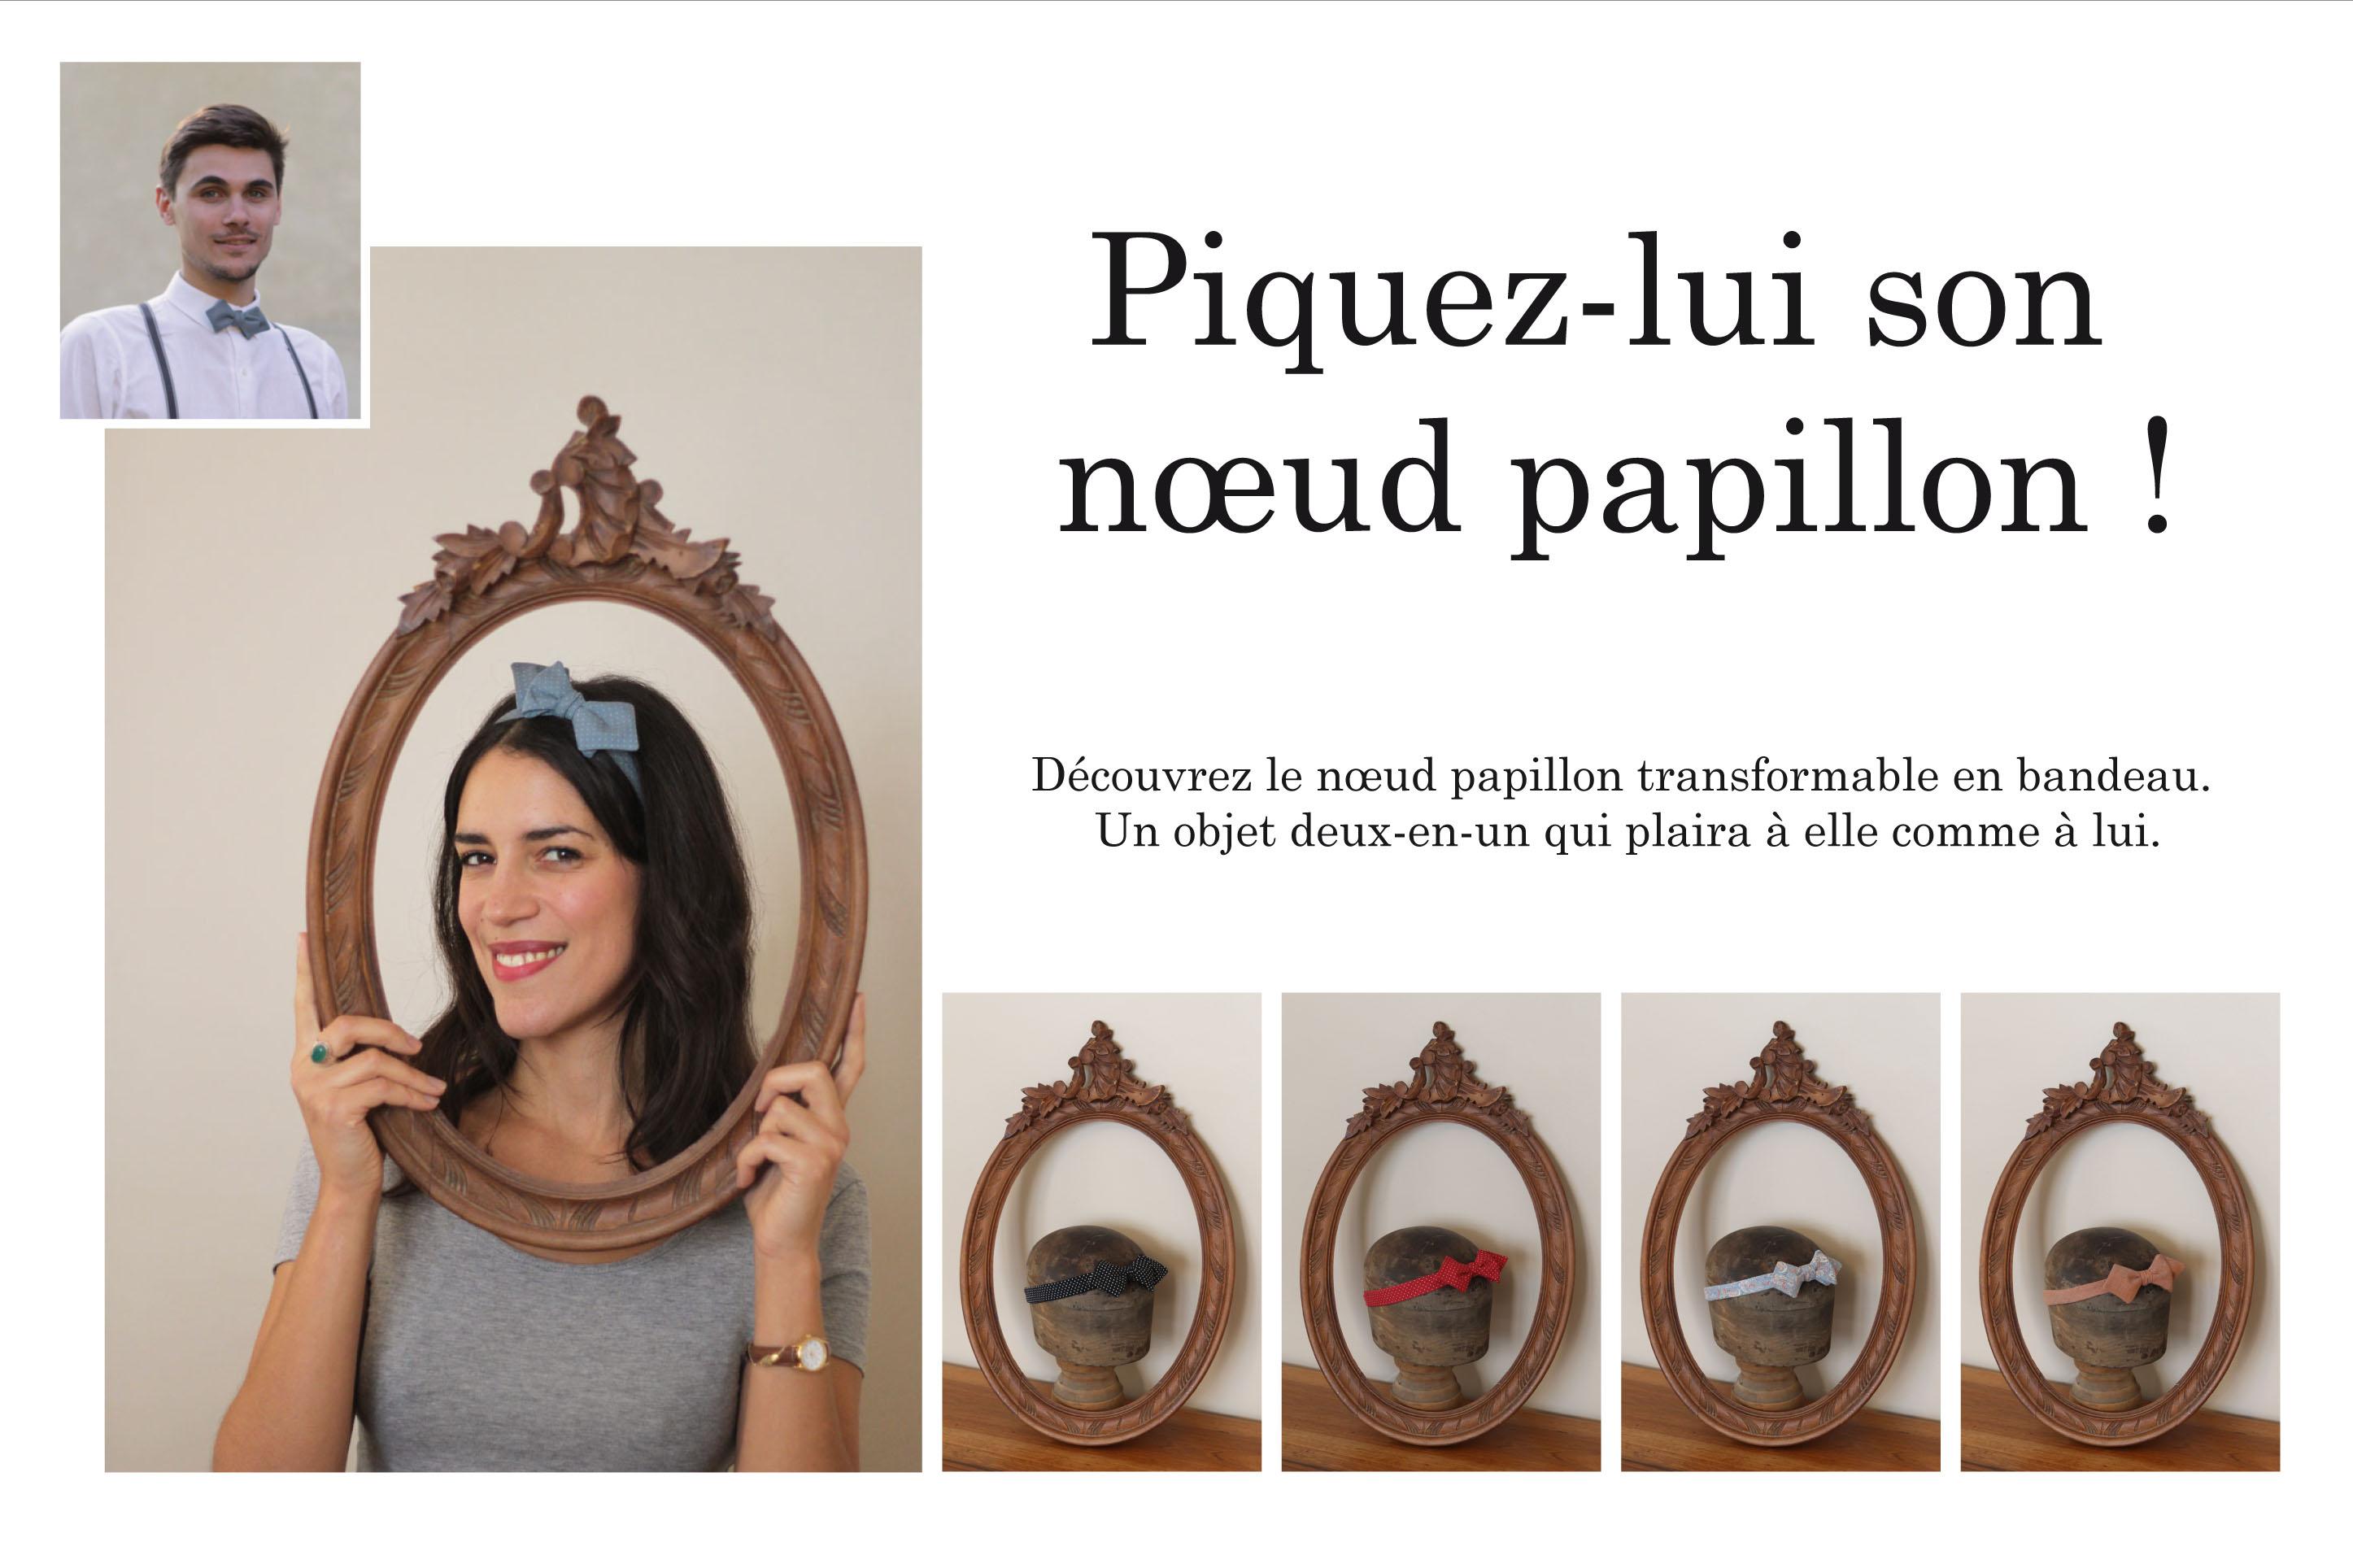 Monsieur Etienne noeuds papillon - Handband